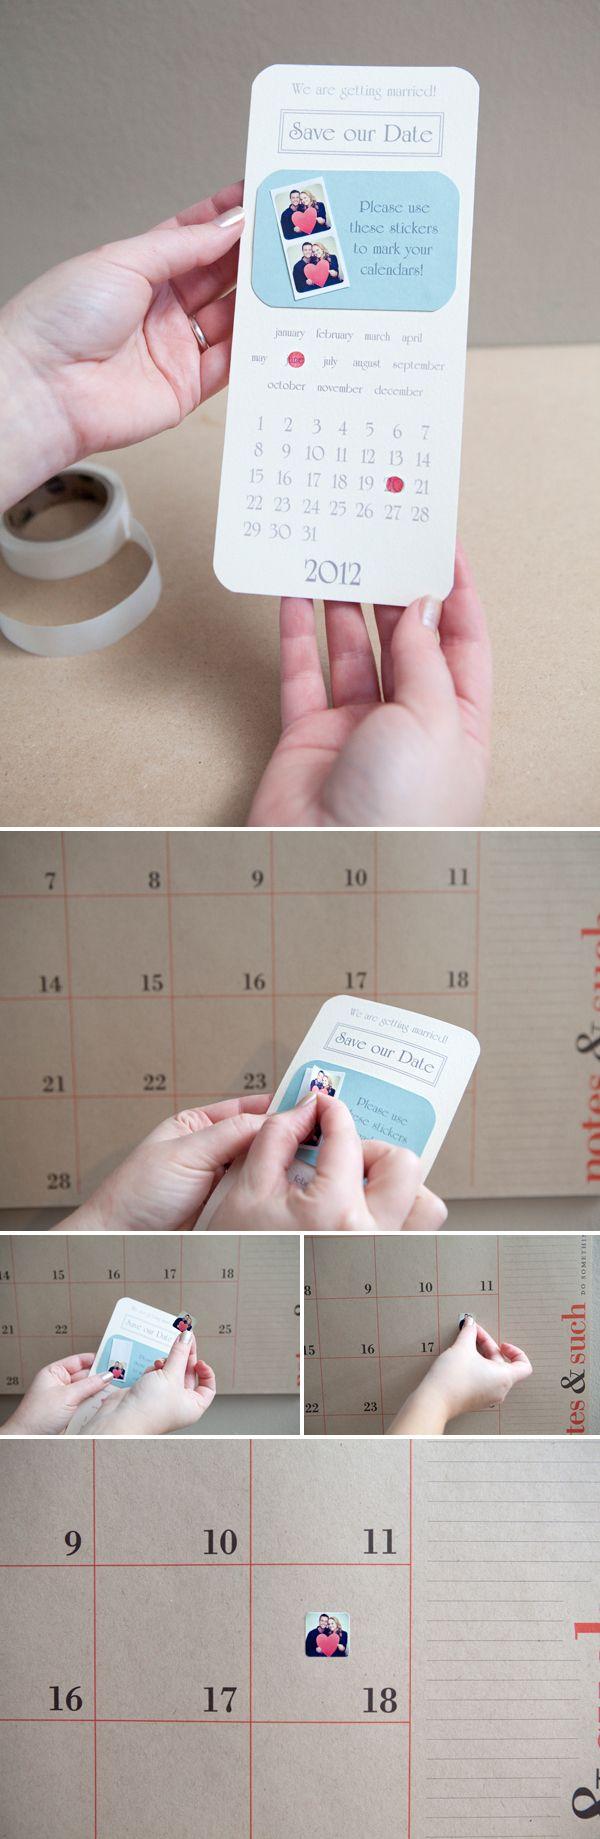 Save the Date stickers! what a cute idea!